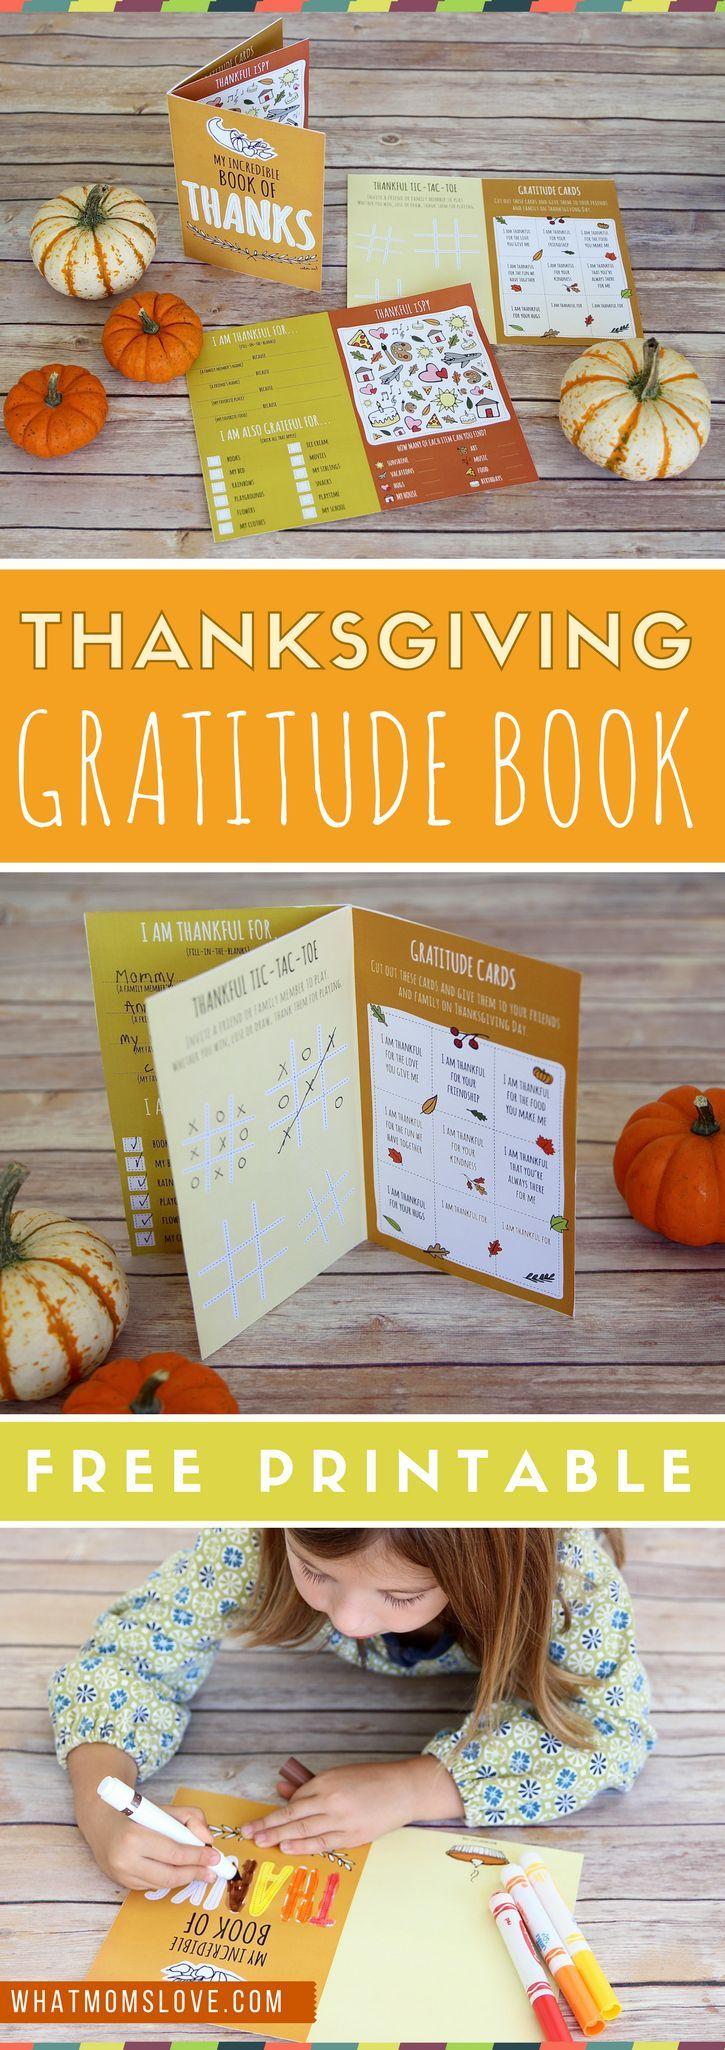 Free Printable Thanksgiving Gratitude Book for Kids